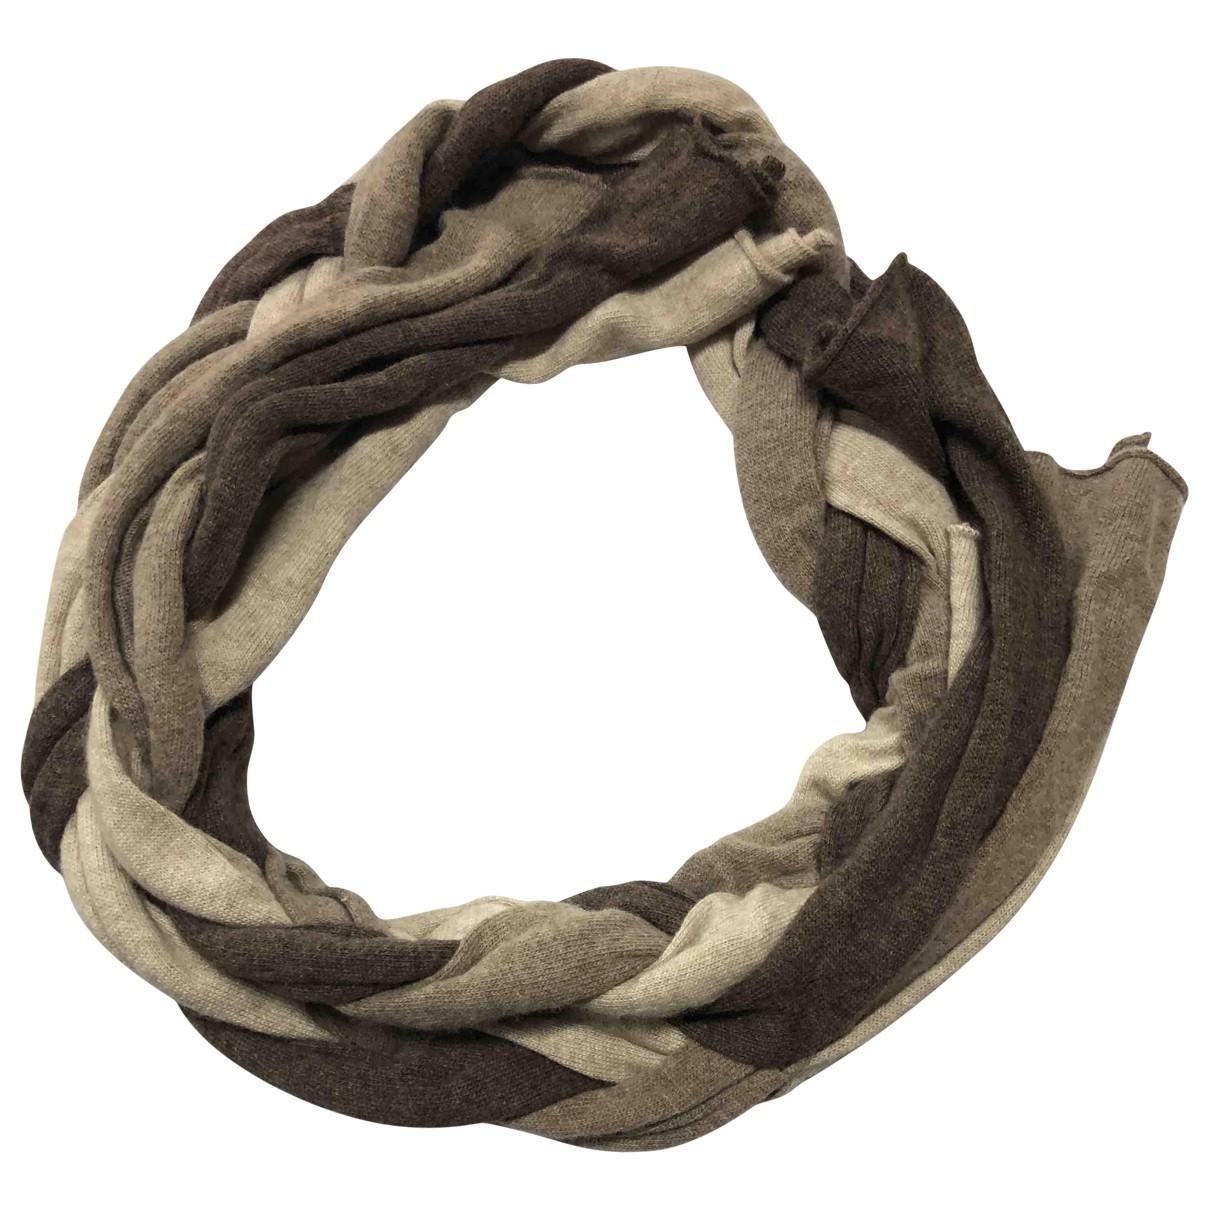 Armani Collezioni \N Schal in  Beige Wolle